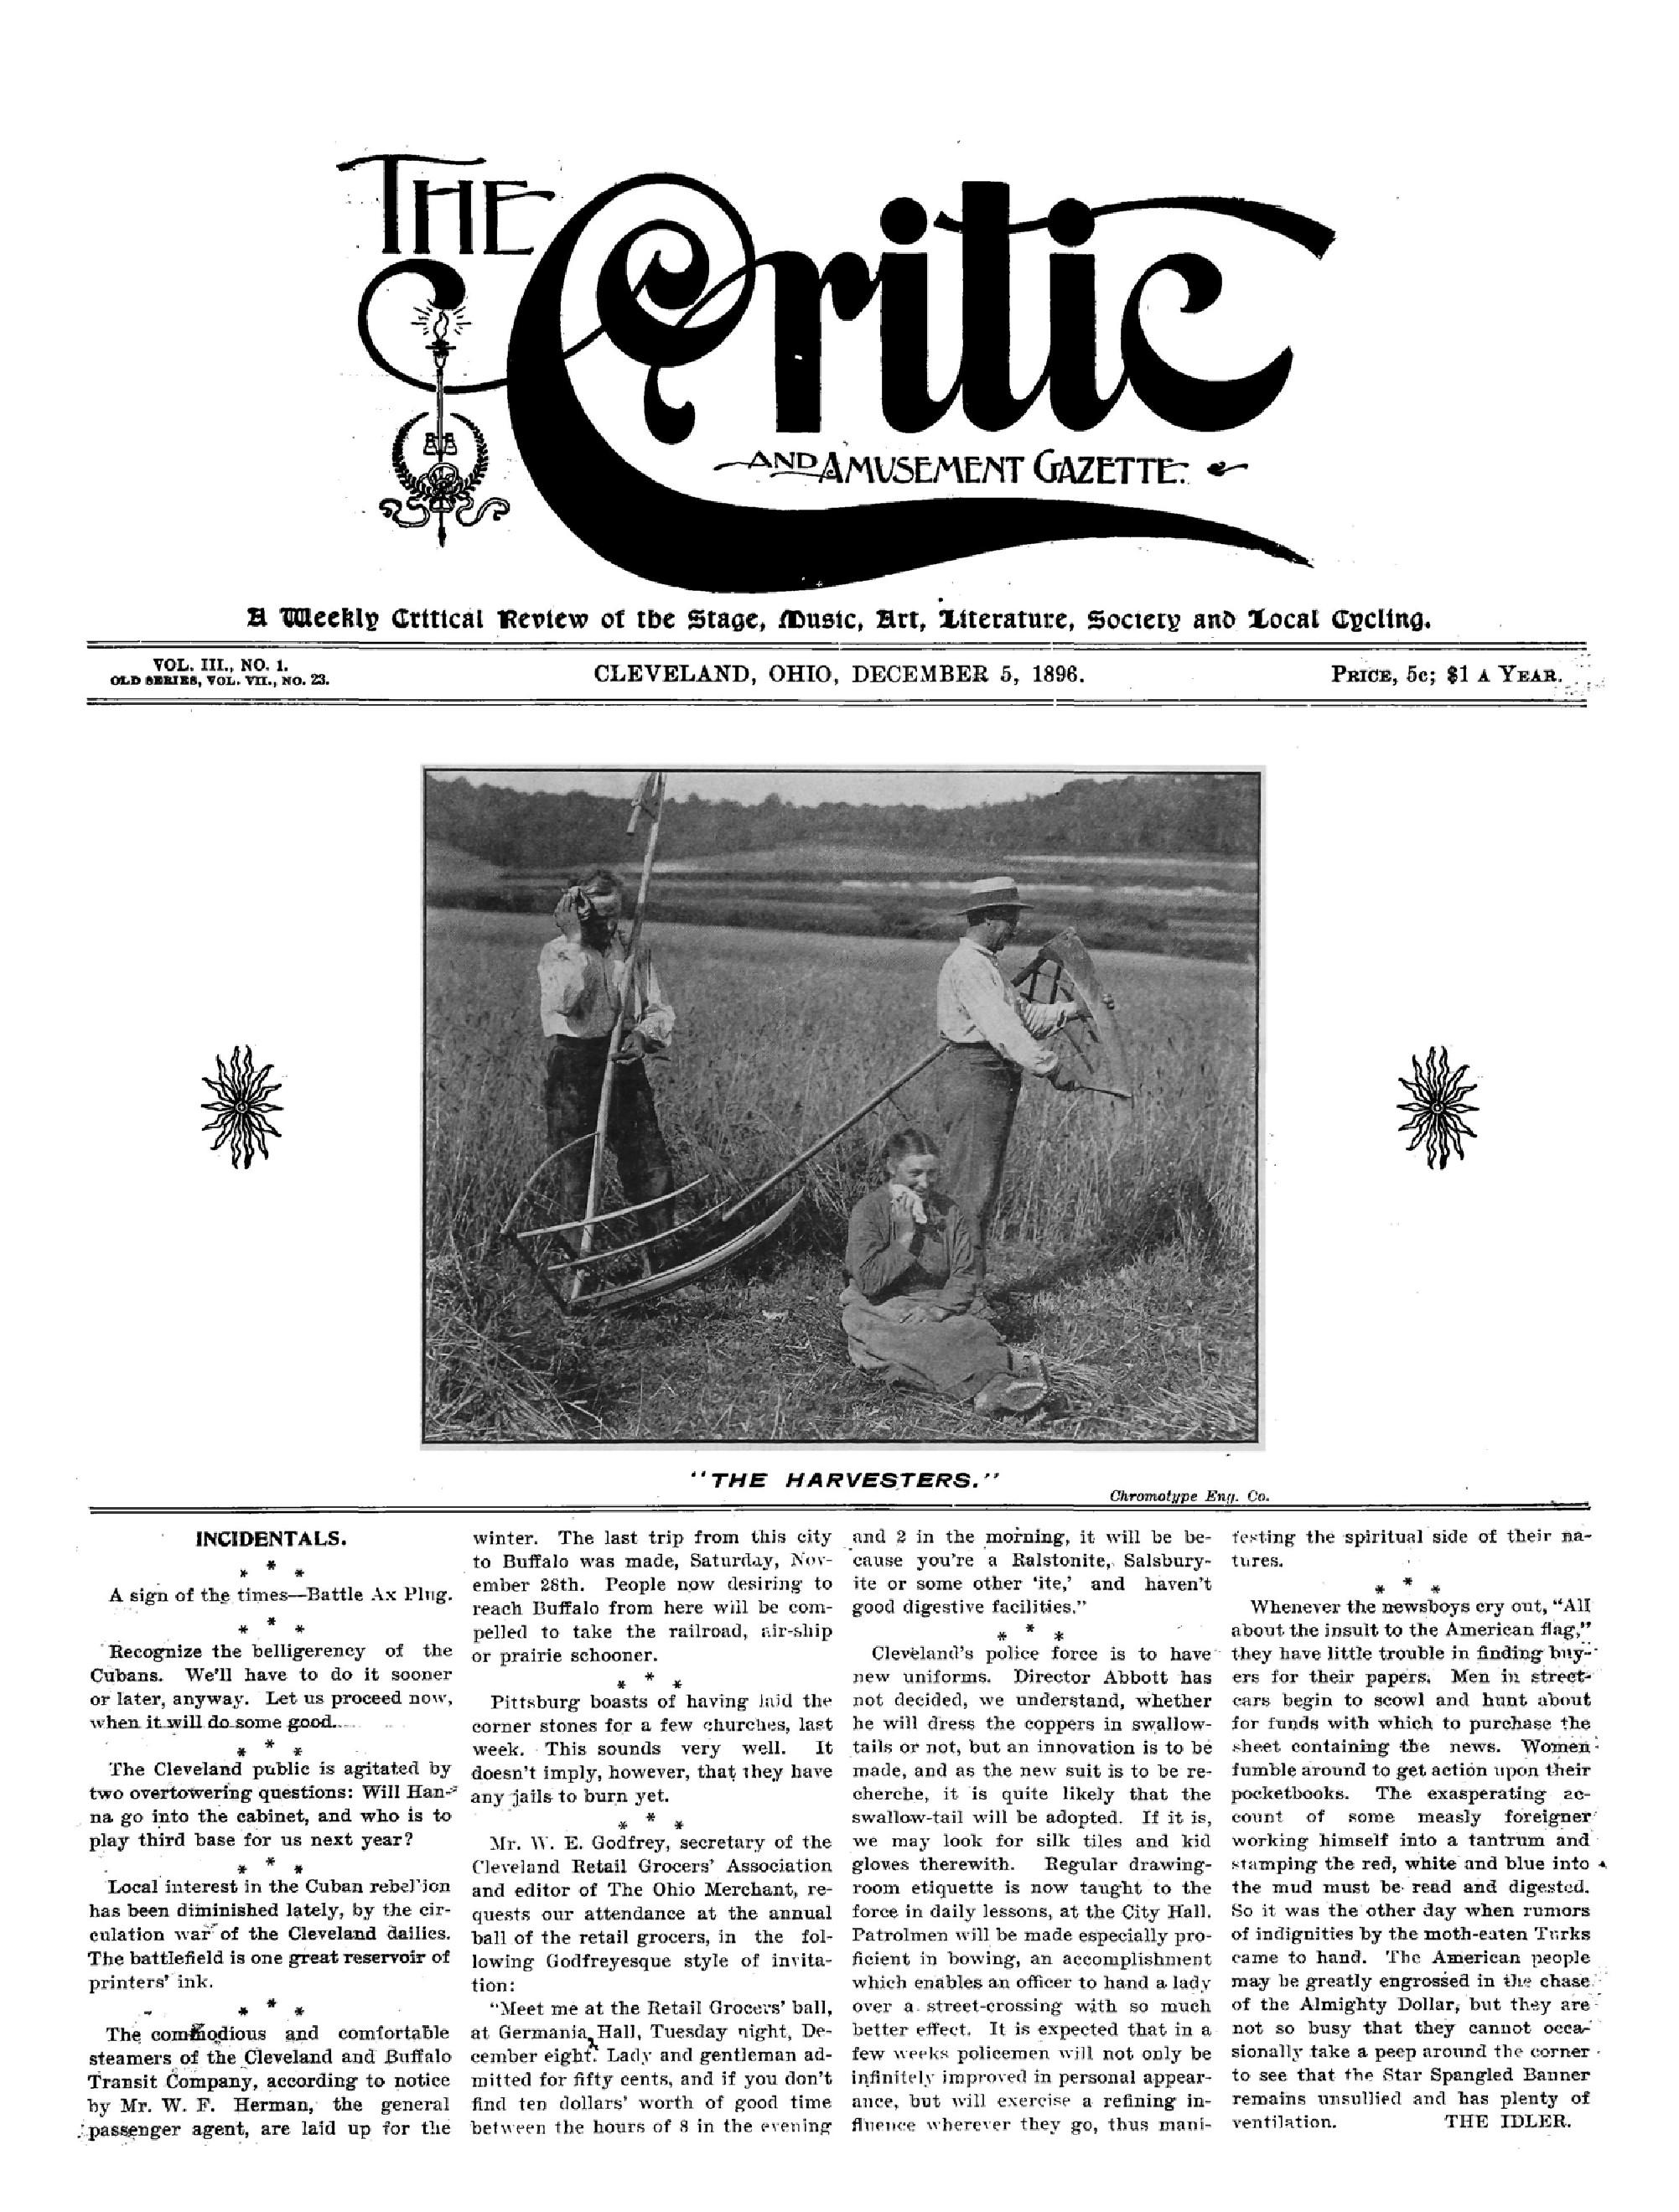 December 1896